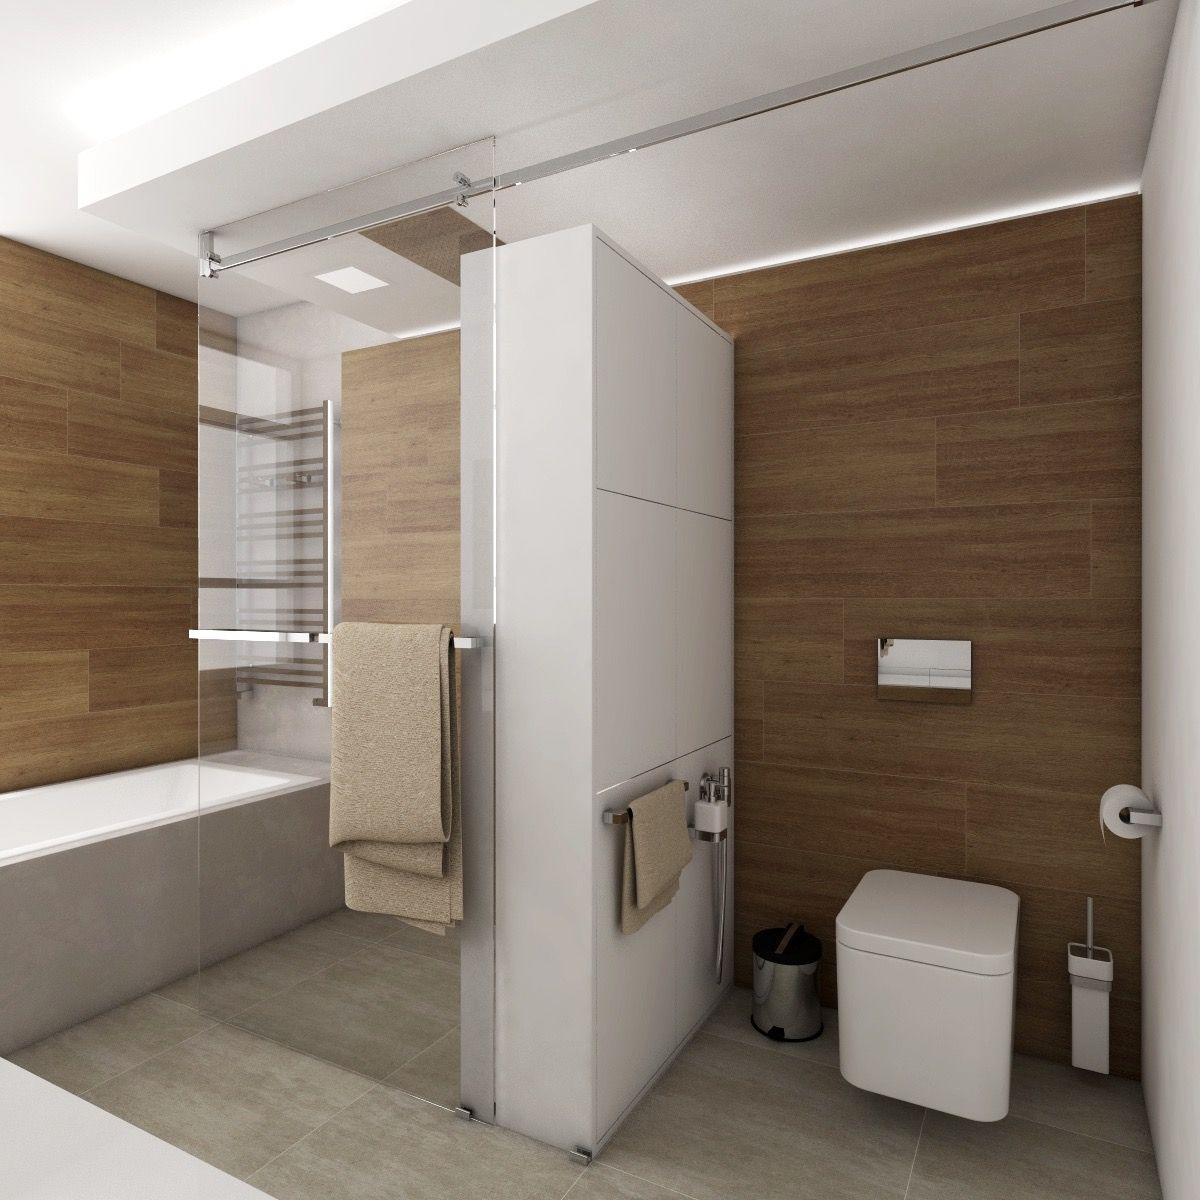 Bad Designs Bad Modern 2017 Wohndesign Designs Badezimmer Braun Einzigartig Bad Modern 2017 Wohndesig Badezimmer Braun Kleine Badezimmer Design Badezimmerfarbe